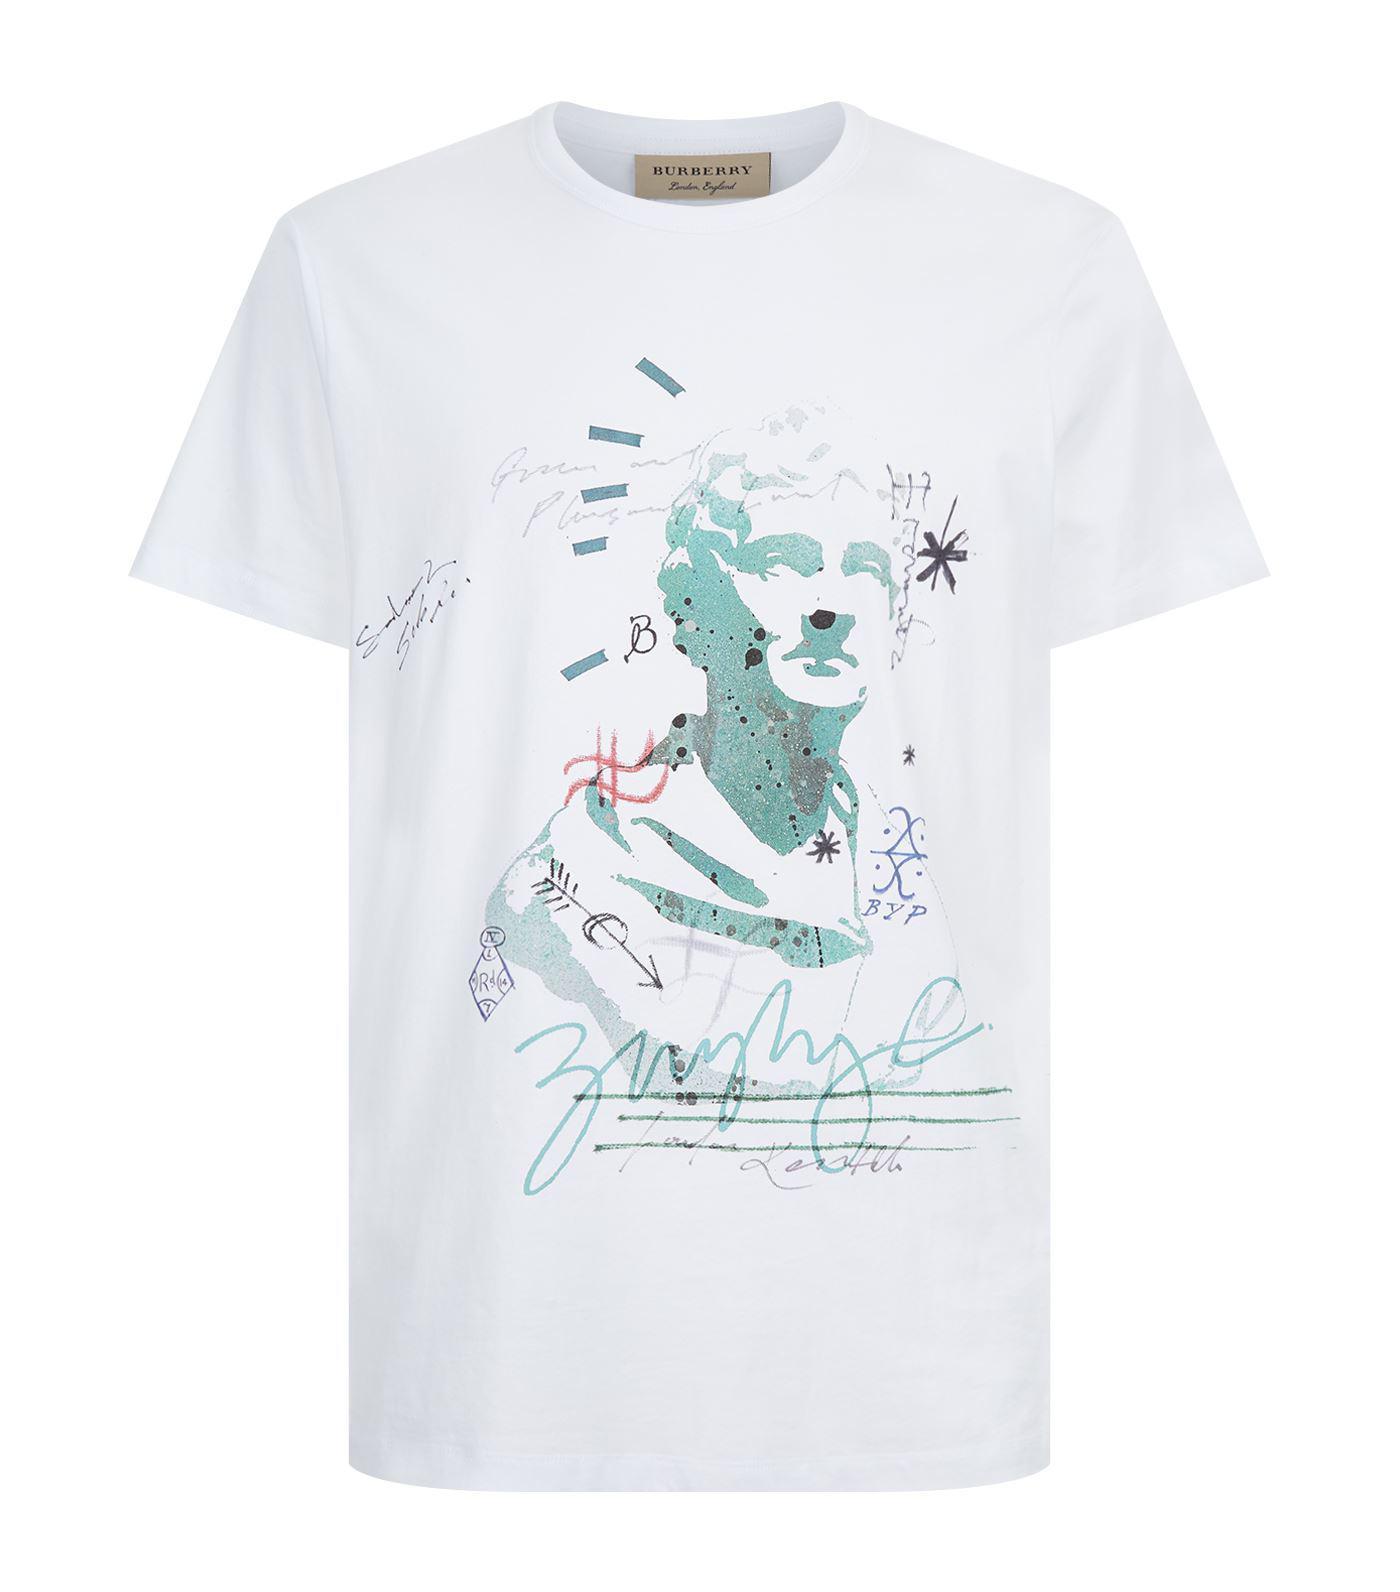 8ba45b947 Burberry Statue Print T-shirt in White for Men - Lyst